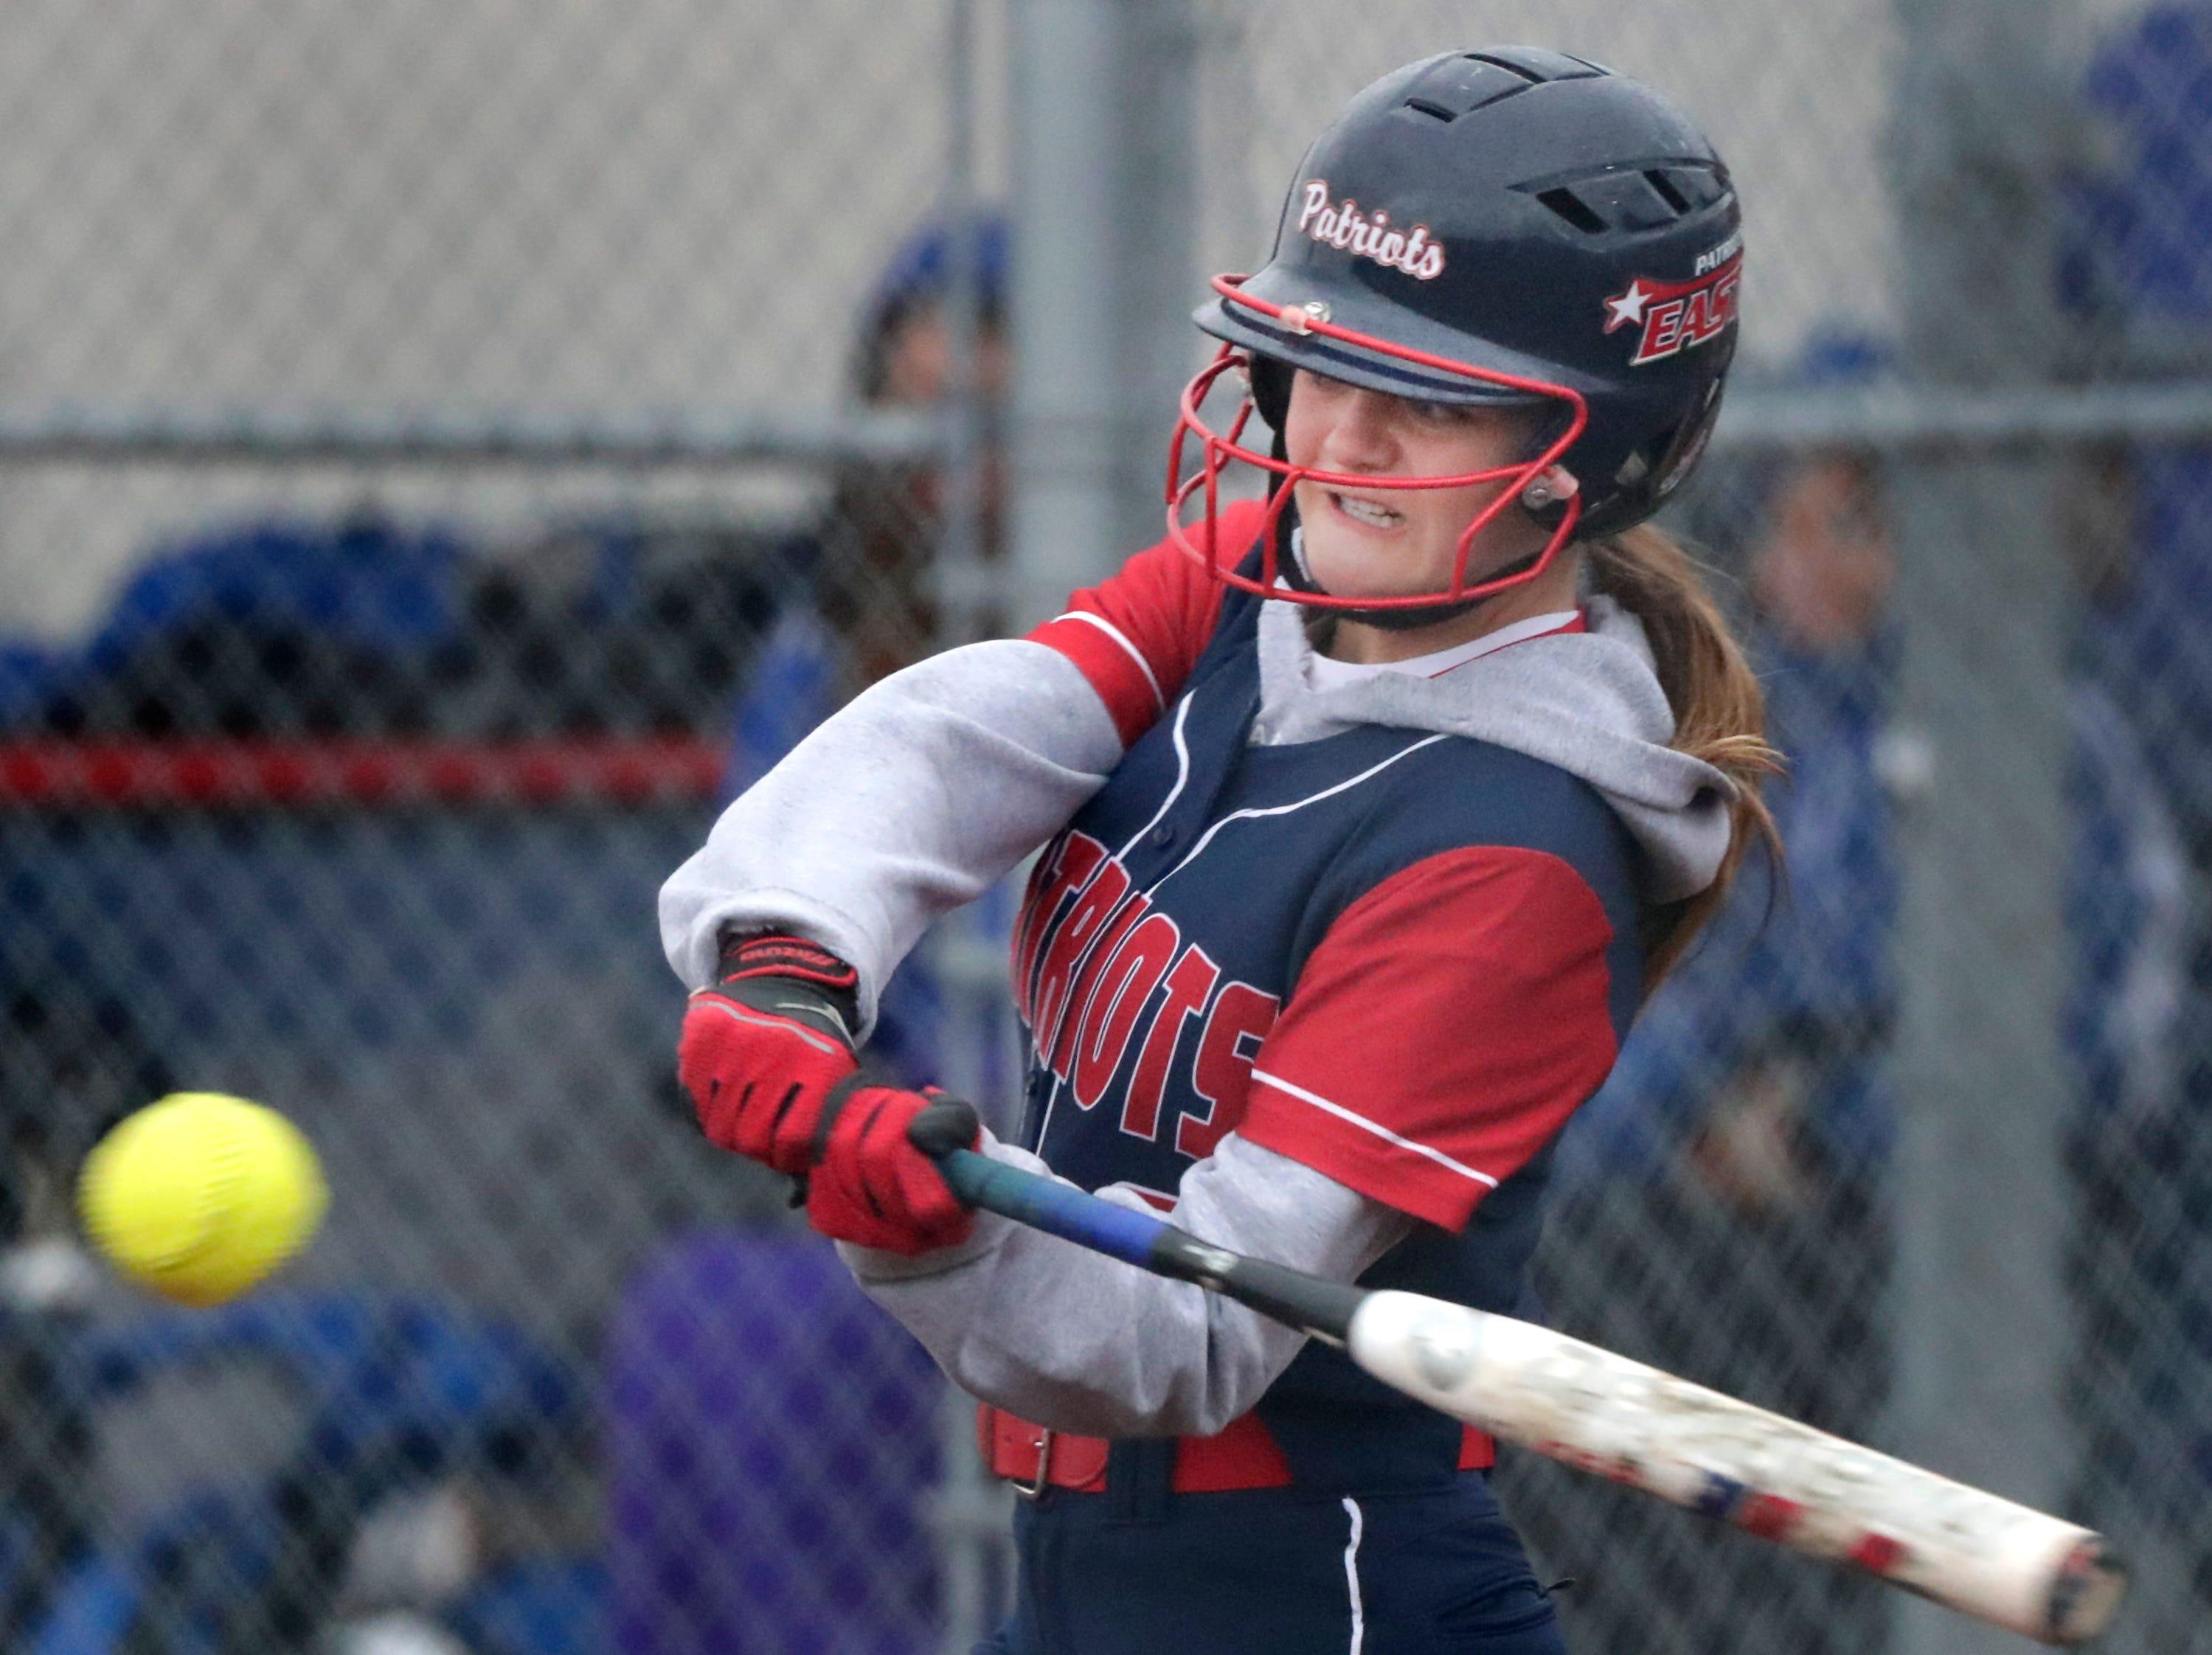 Appleton East High School's #9 Olivia Reichardt against Oshkosh West High School during their softball game  on Thursday, April 18, 2019, in Appleton, Wis. Wm. Glasheen/USA TODAY NETWORK-Wisconsin.